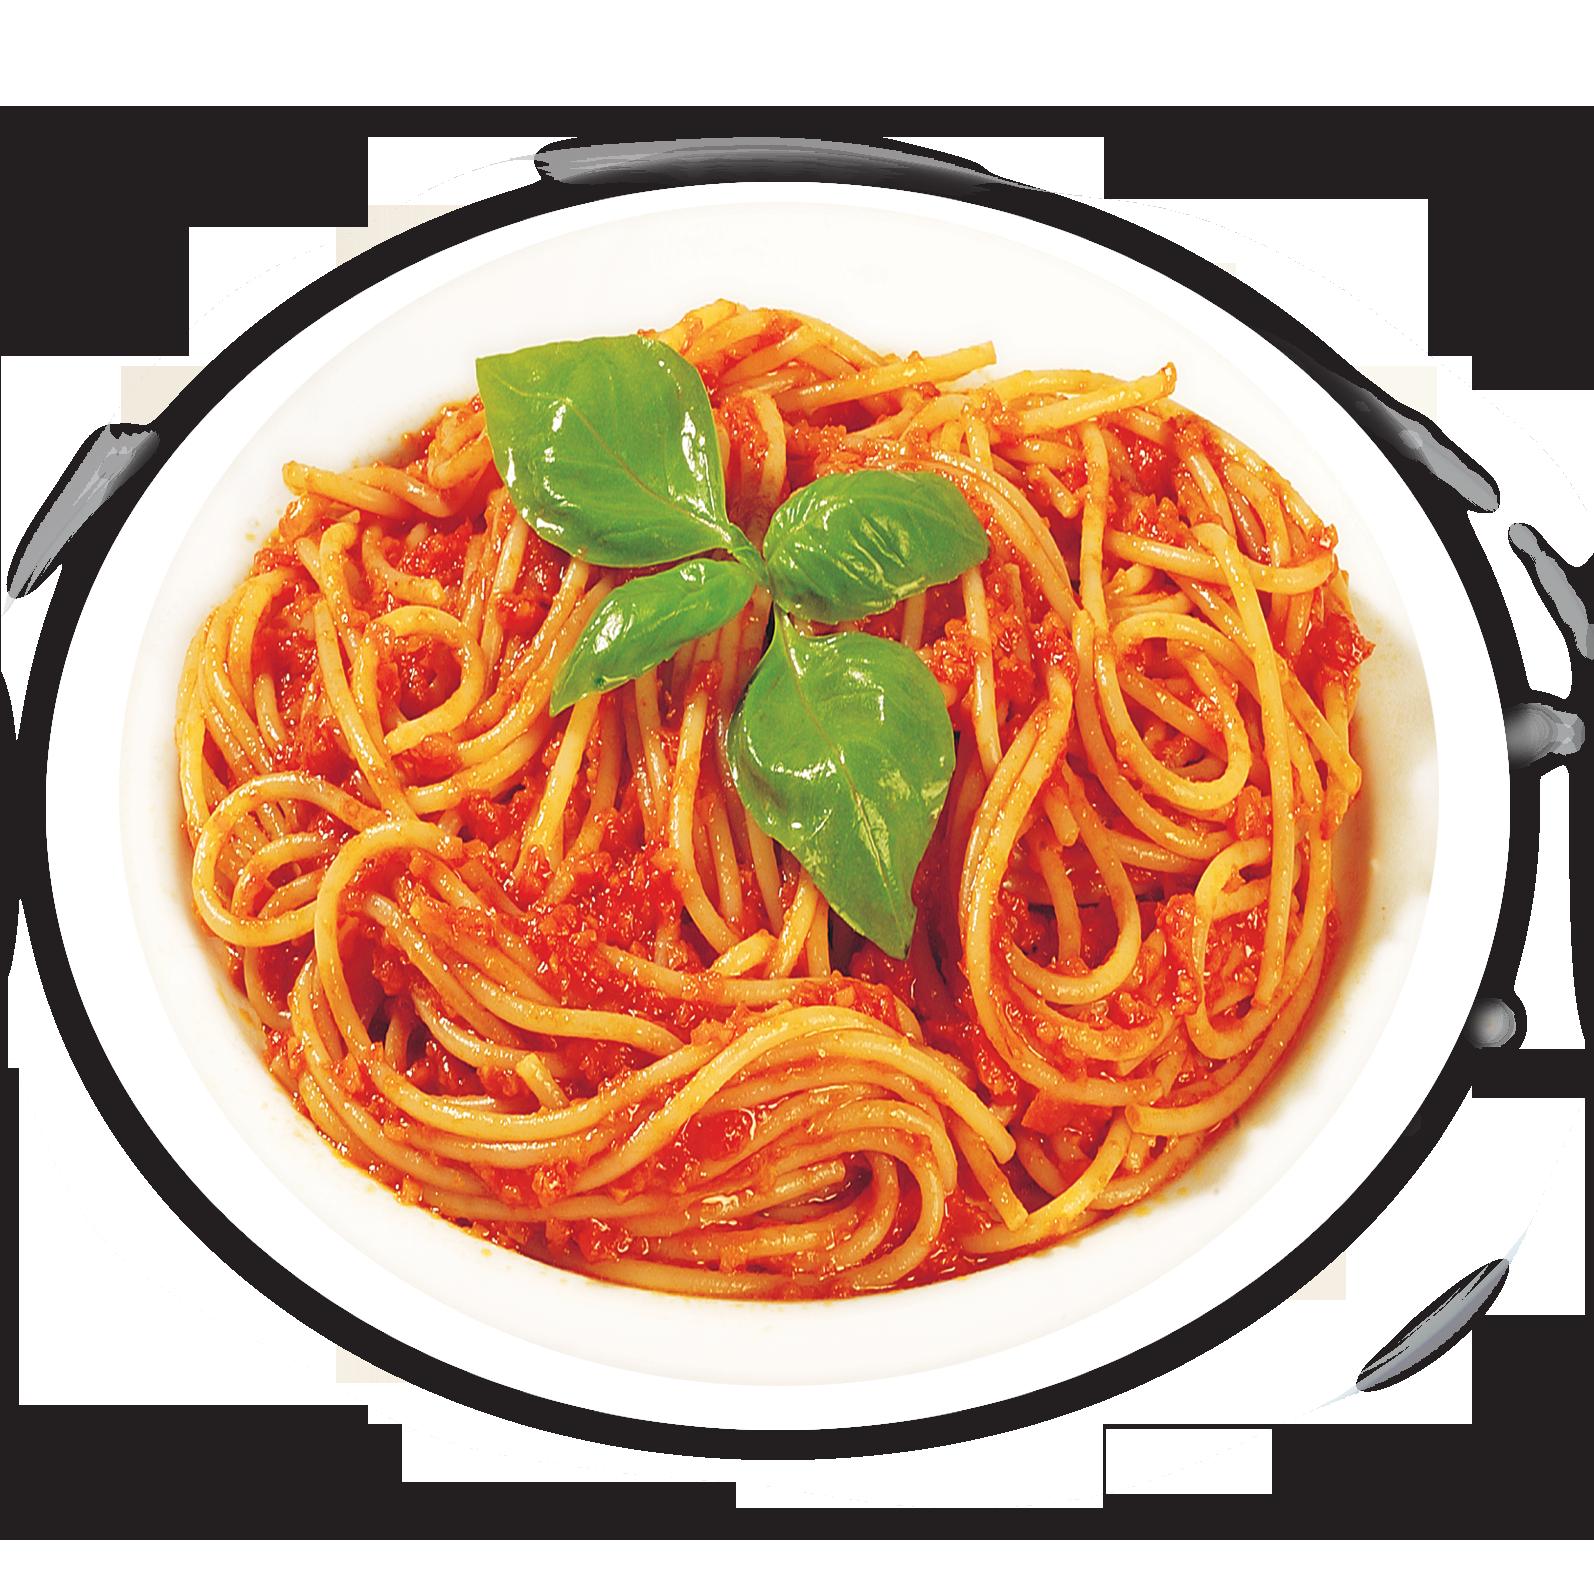 Spaghetti PNG Image